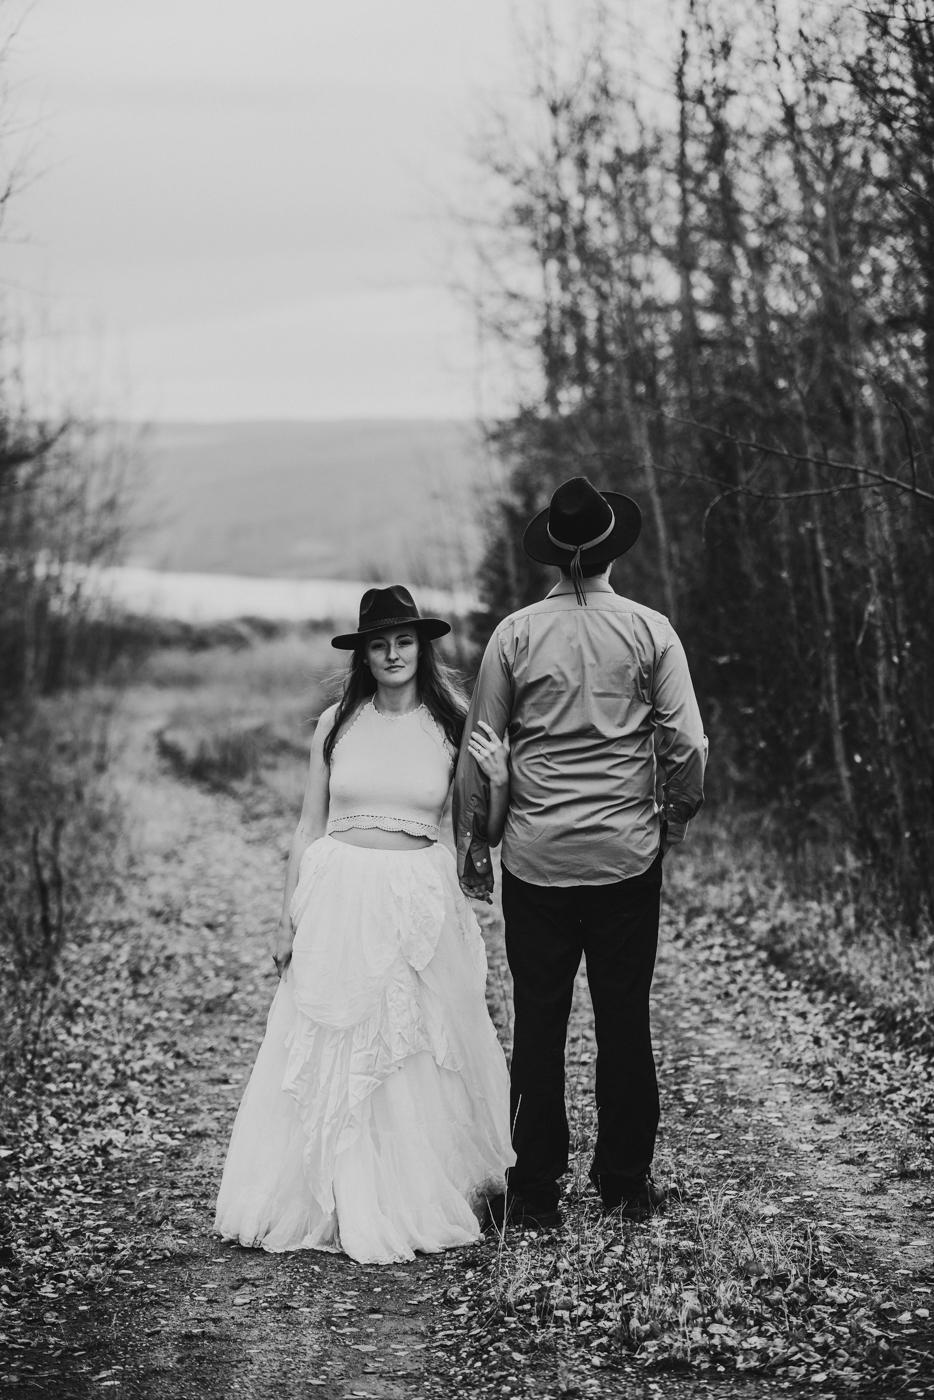 FortSt.John_photographer_TyraEPhotography_Wedding_Couple_Family_Photograhy_DawsonCreek_Elopement_Bride_Boduoir_Portraits-26.jpg